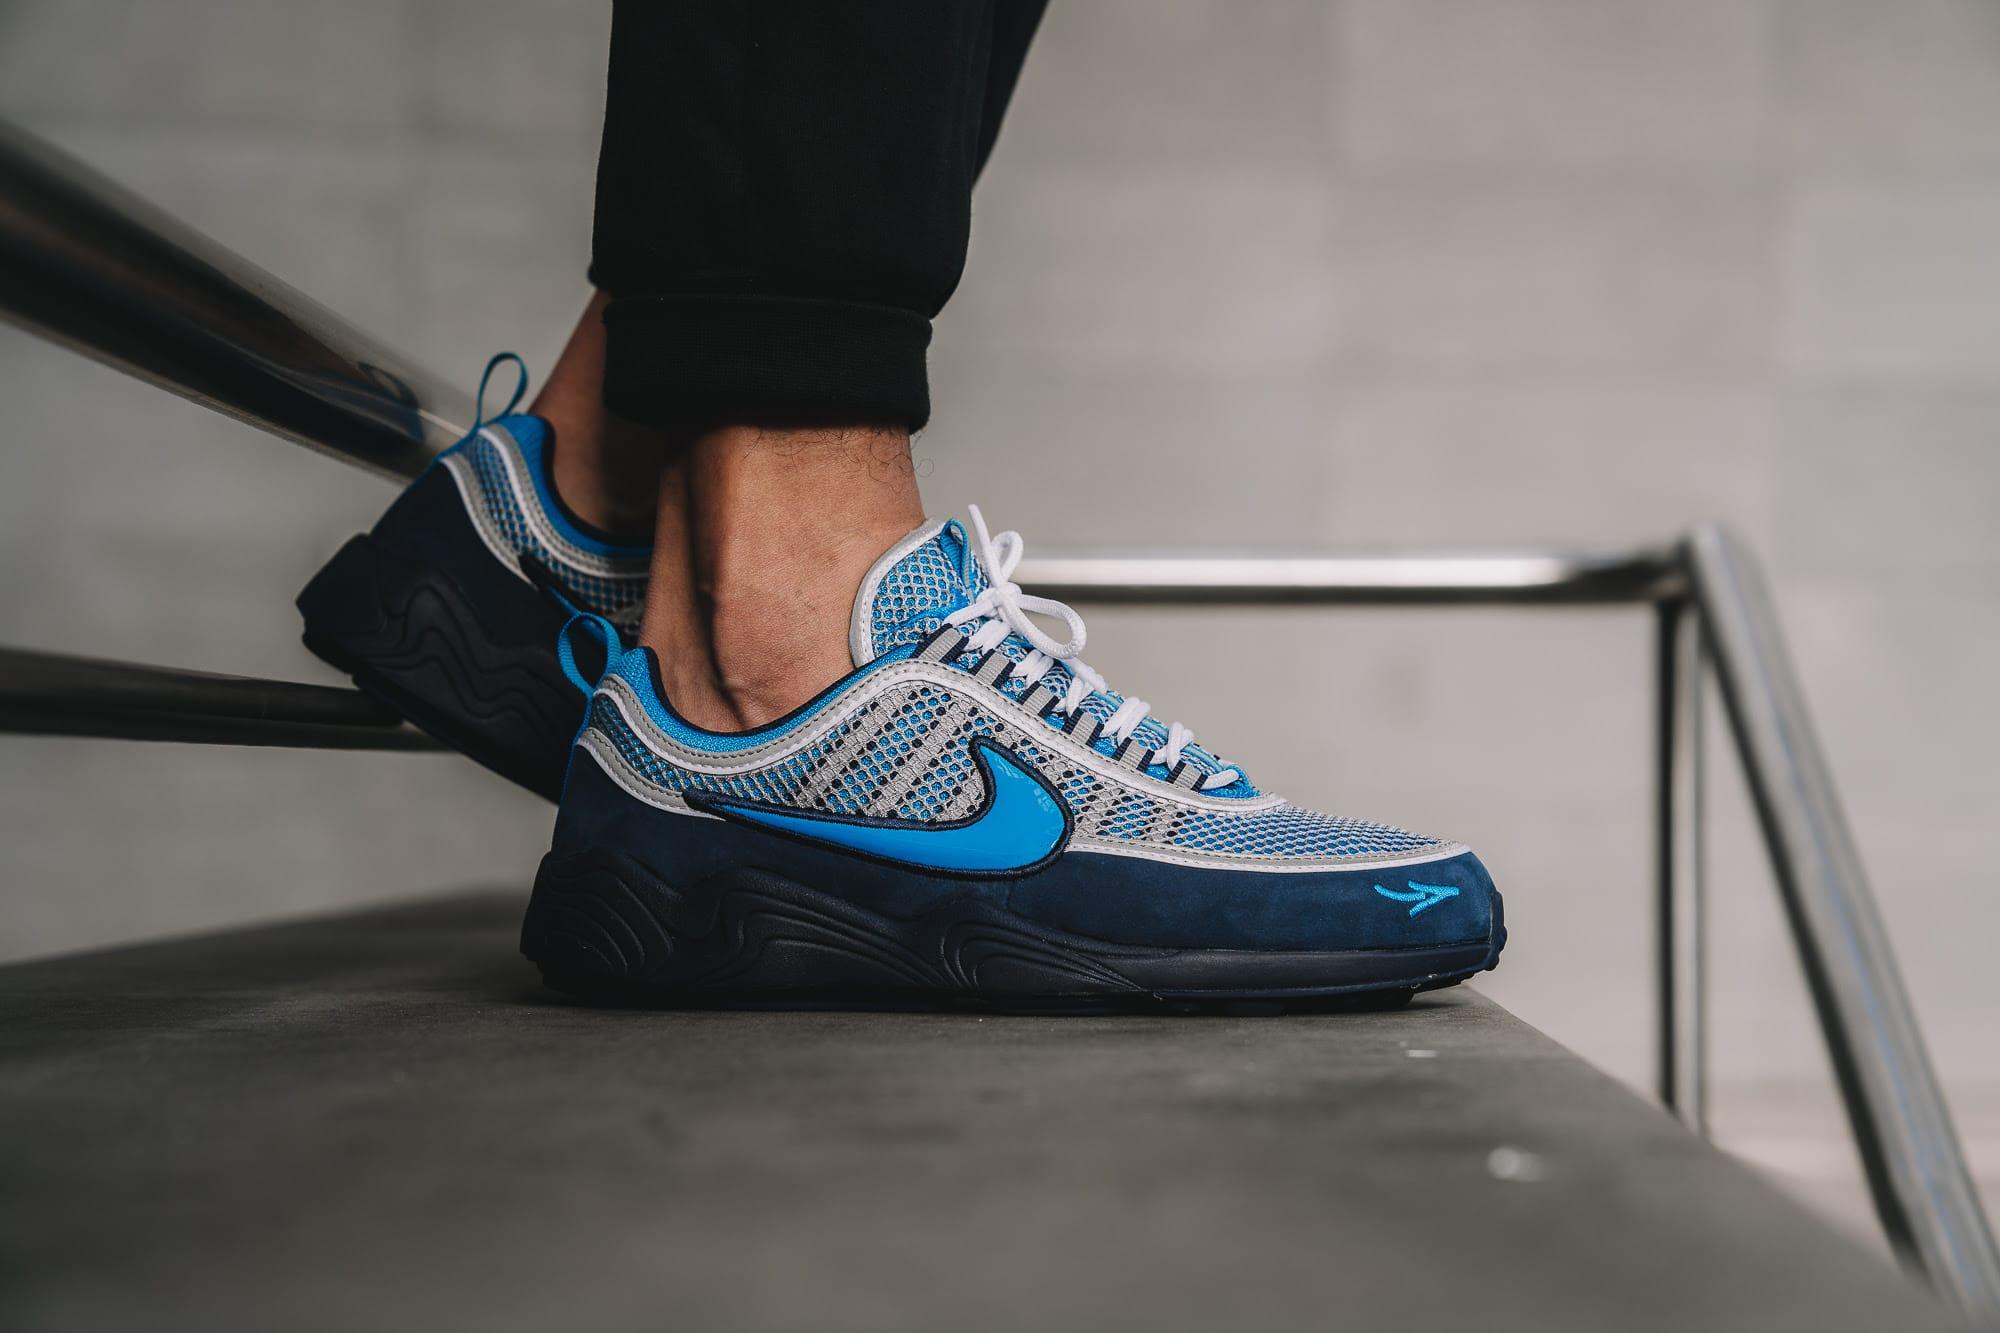 STASH x Nike Air Zoom Spiridon '16 on